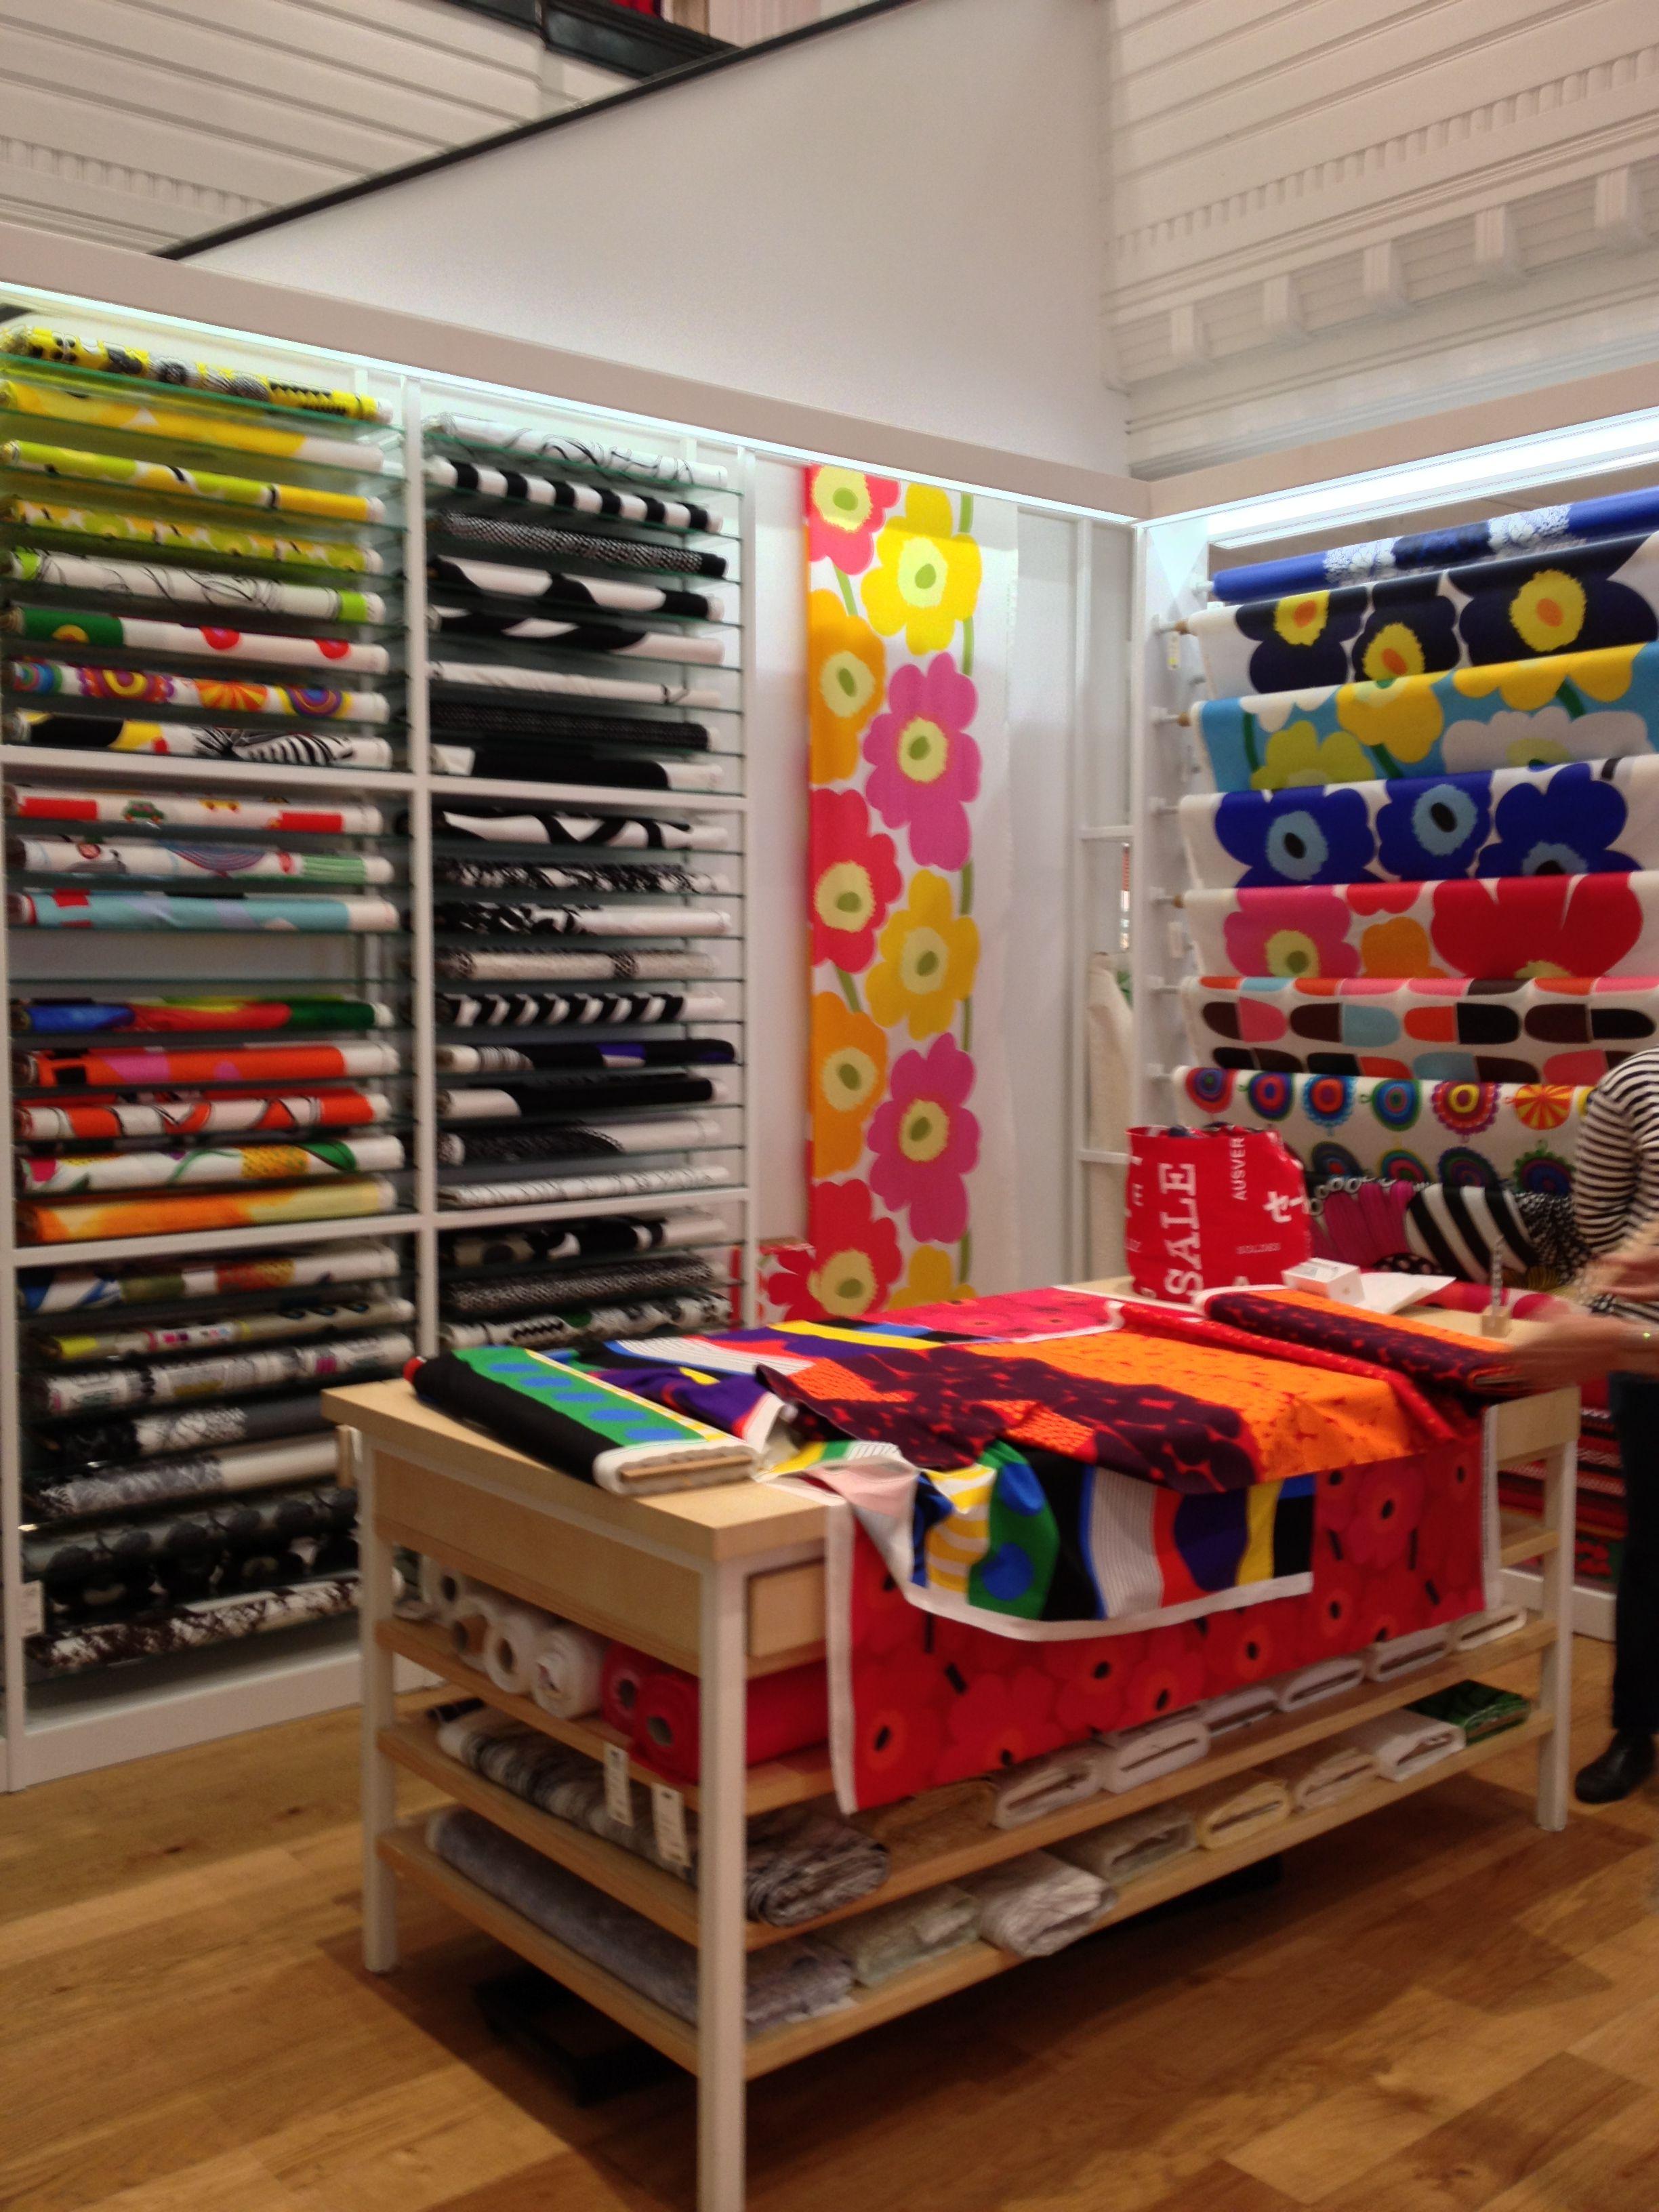 Marimekko Fabric DisplayMarimekko FabricTag DesignBoutique DesignShop